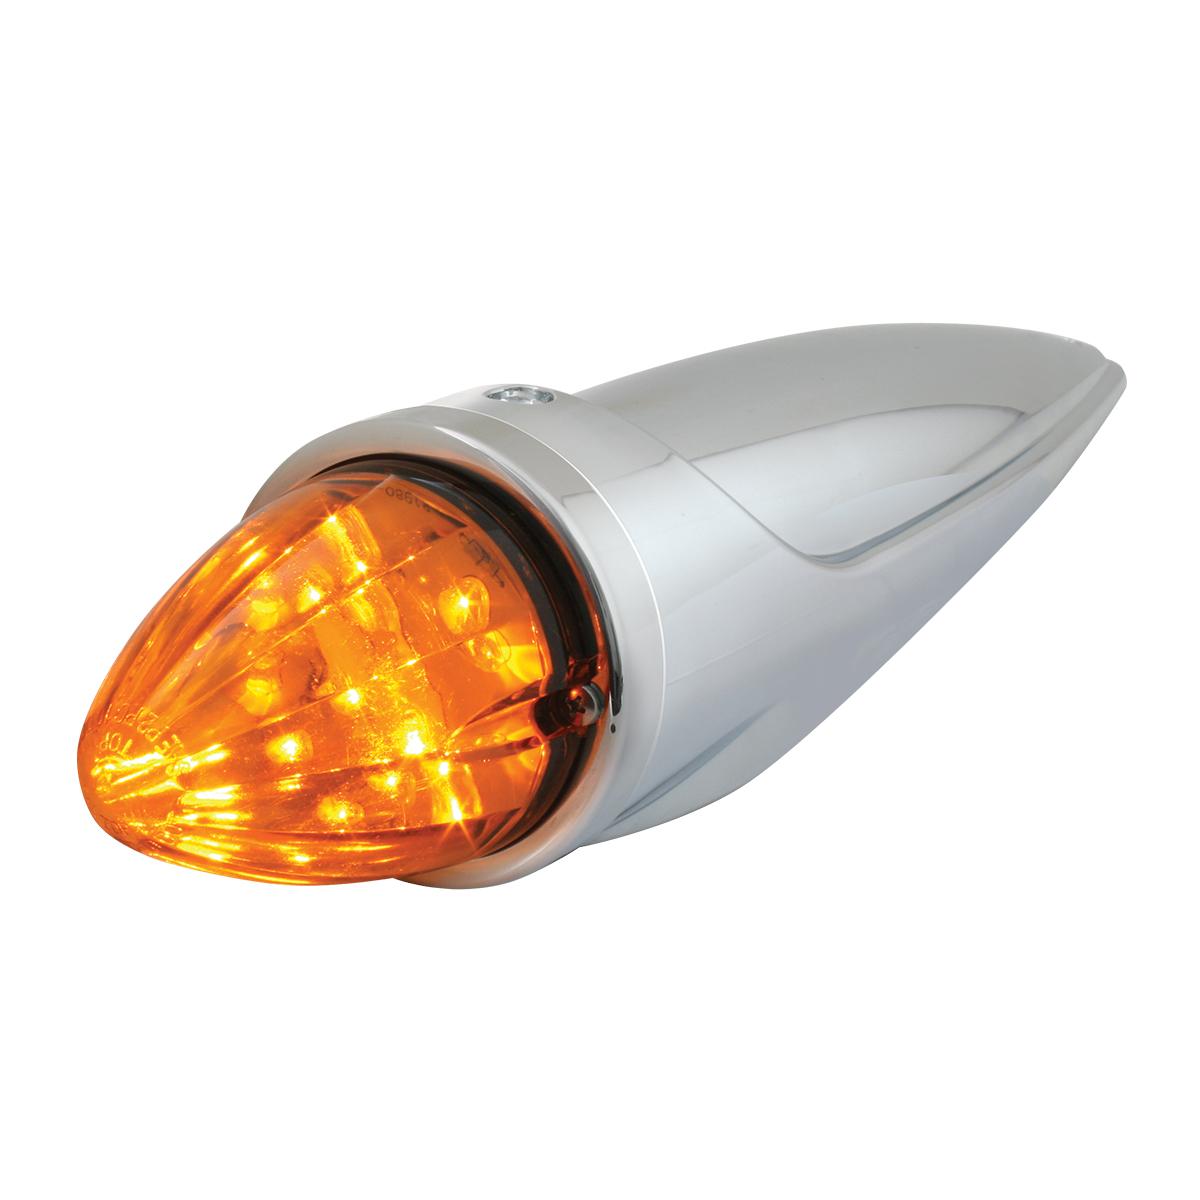 81980 Cab LED Marker Light for G1K